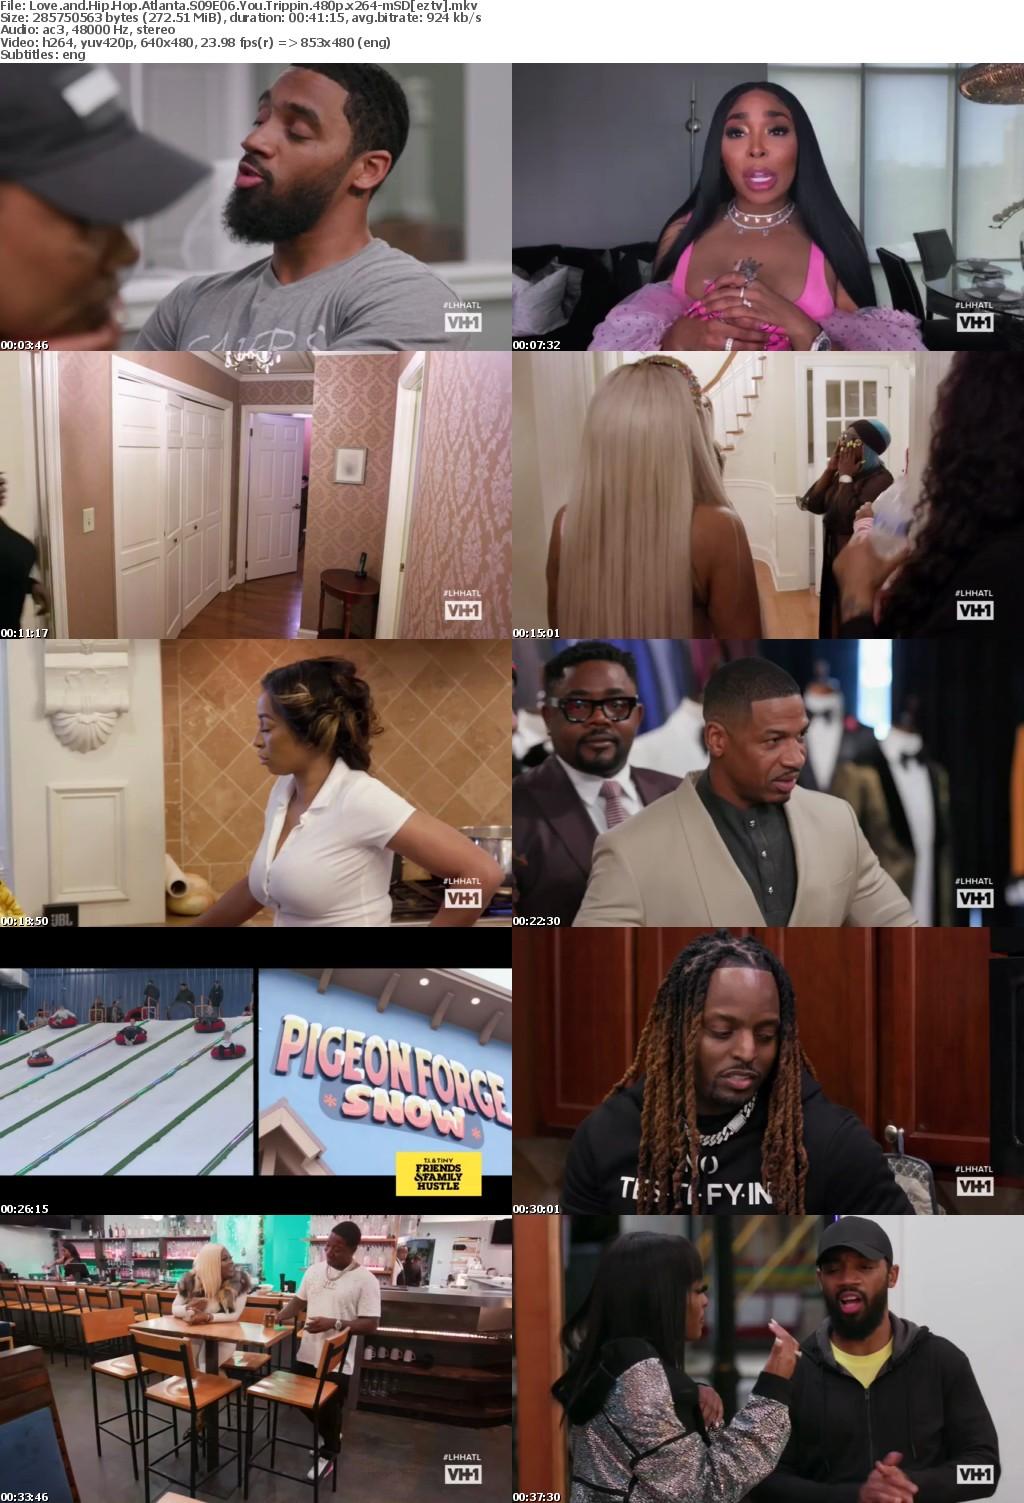 Love and Hip Hop Atlanta S09E06 You Trippin 480p x264-mSD